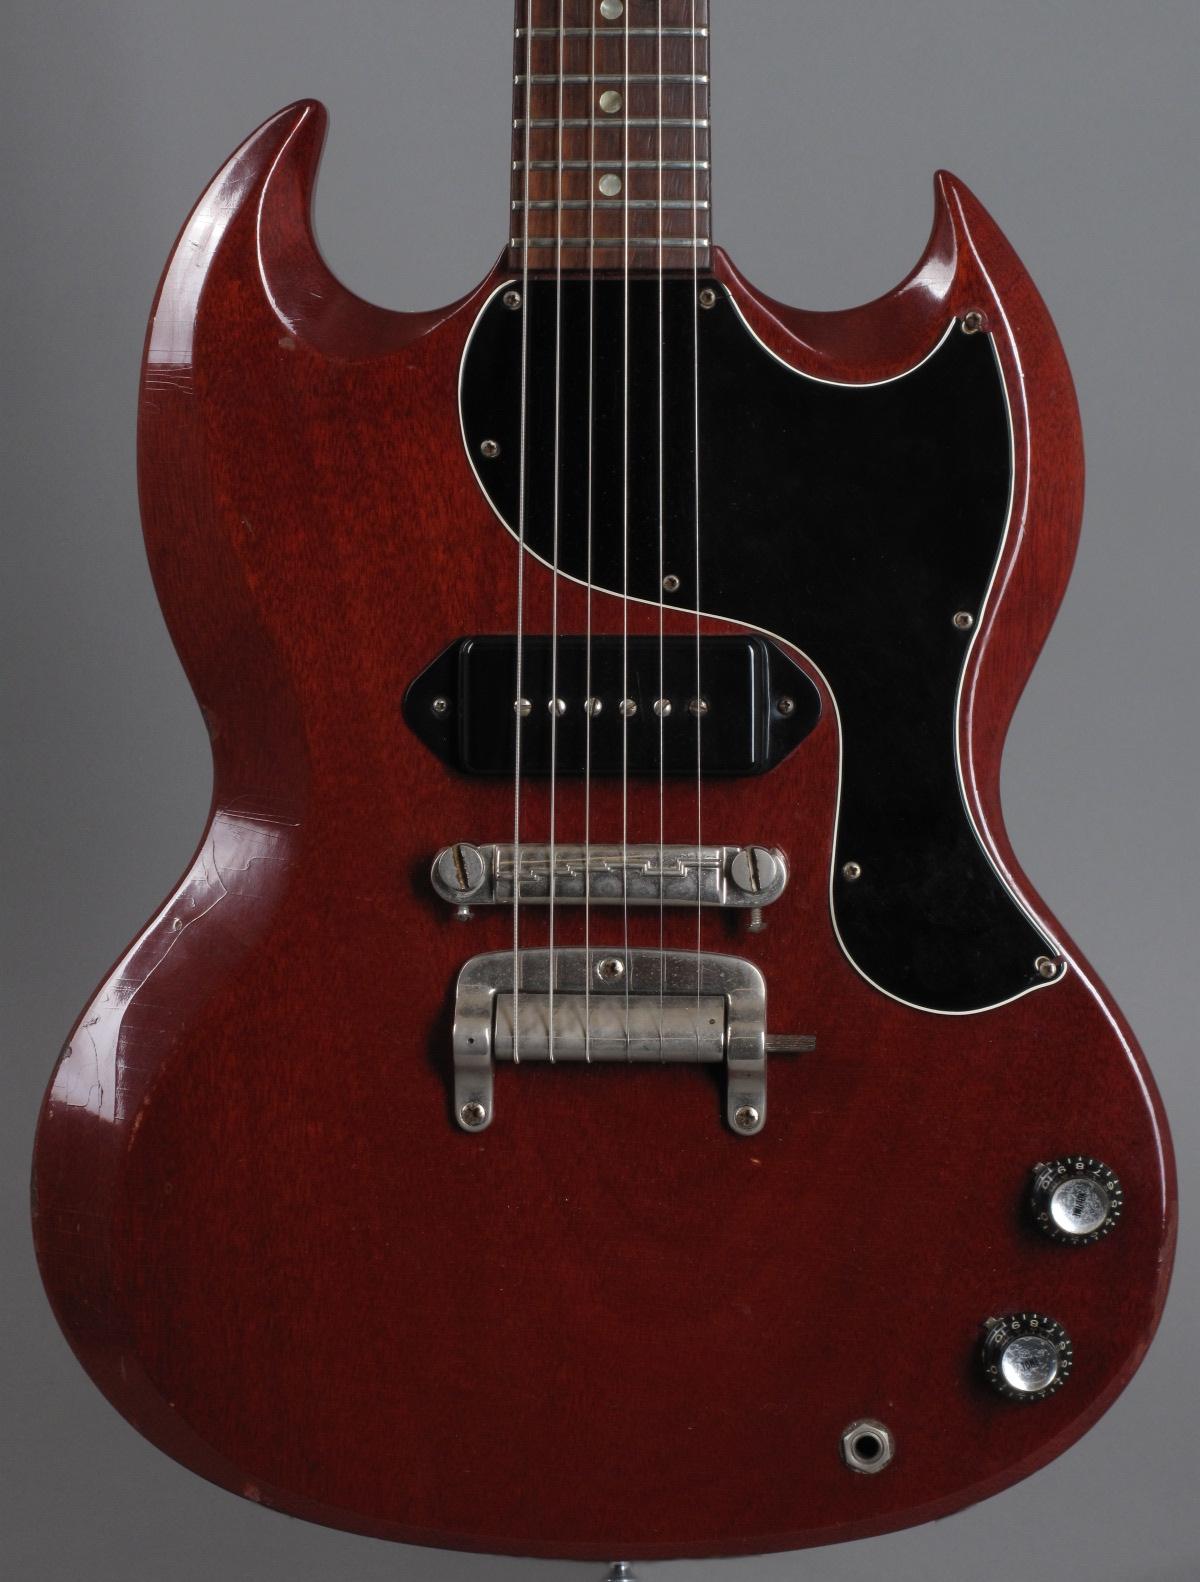 1965 Gibson SG Junior - Cherry